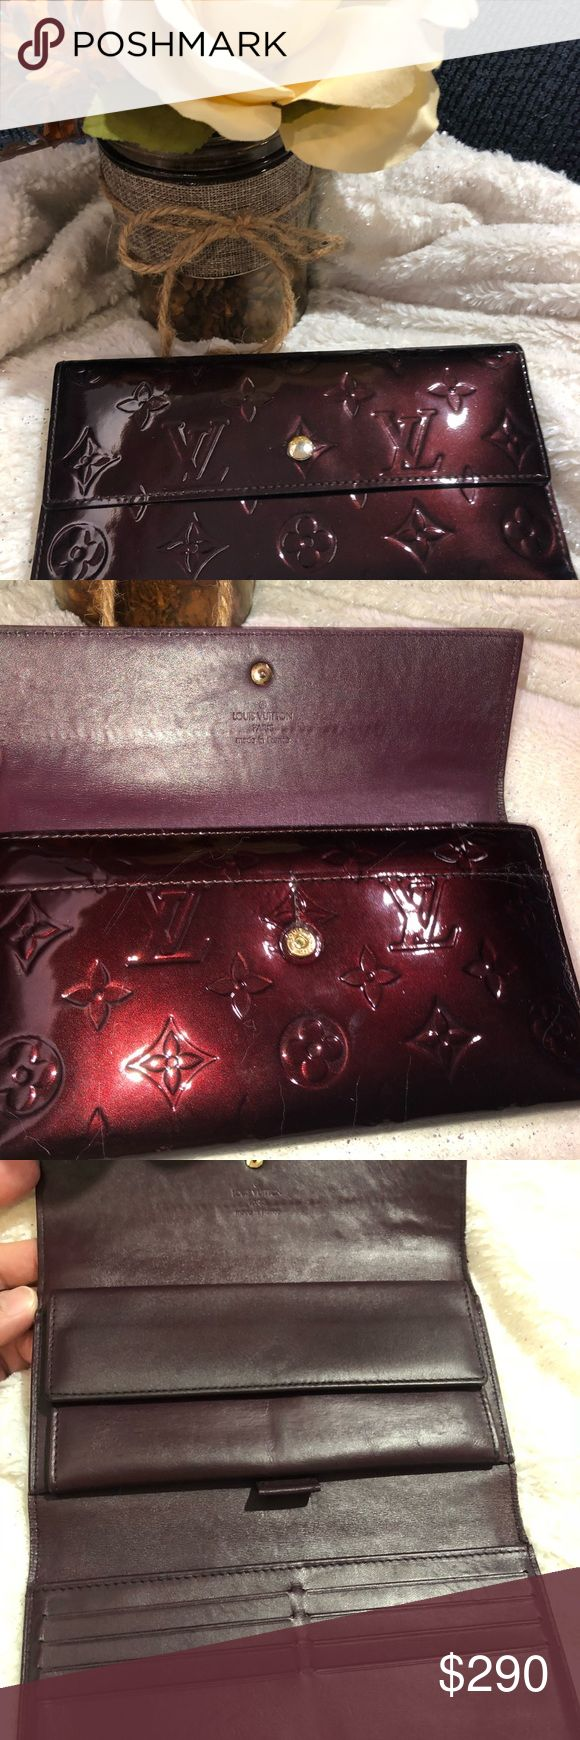 Lv vernis 3-fach Brieftasche Authentic pre loved LV vernis 3-fach Brieftasche in …   – My Posh Closet